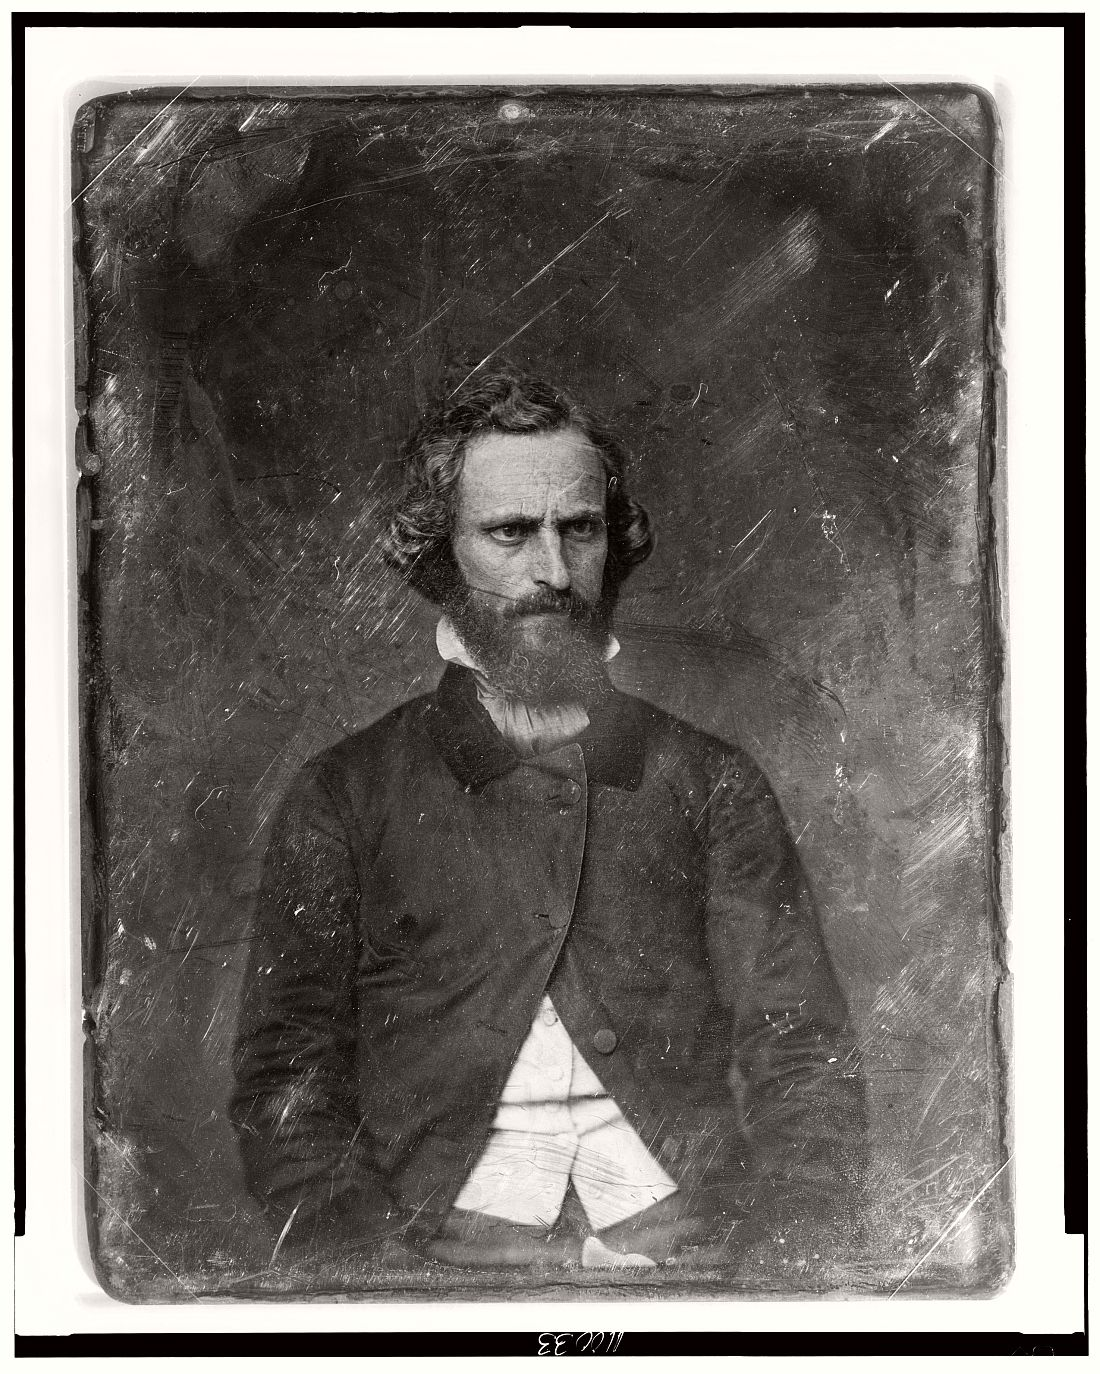 vintage-daguerreotype-portraits-from-xix-century-1844-1860-49